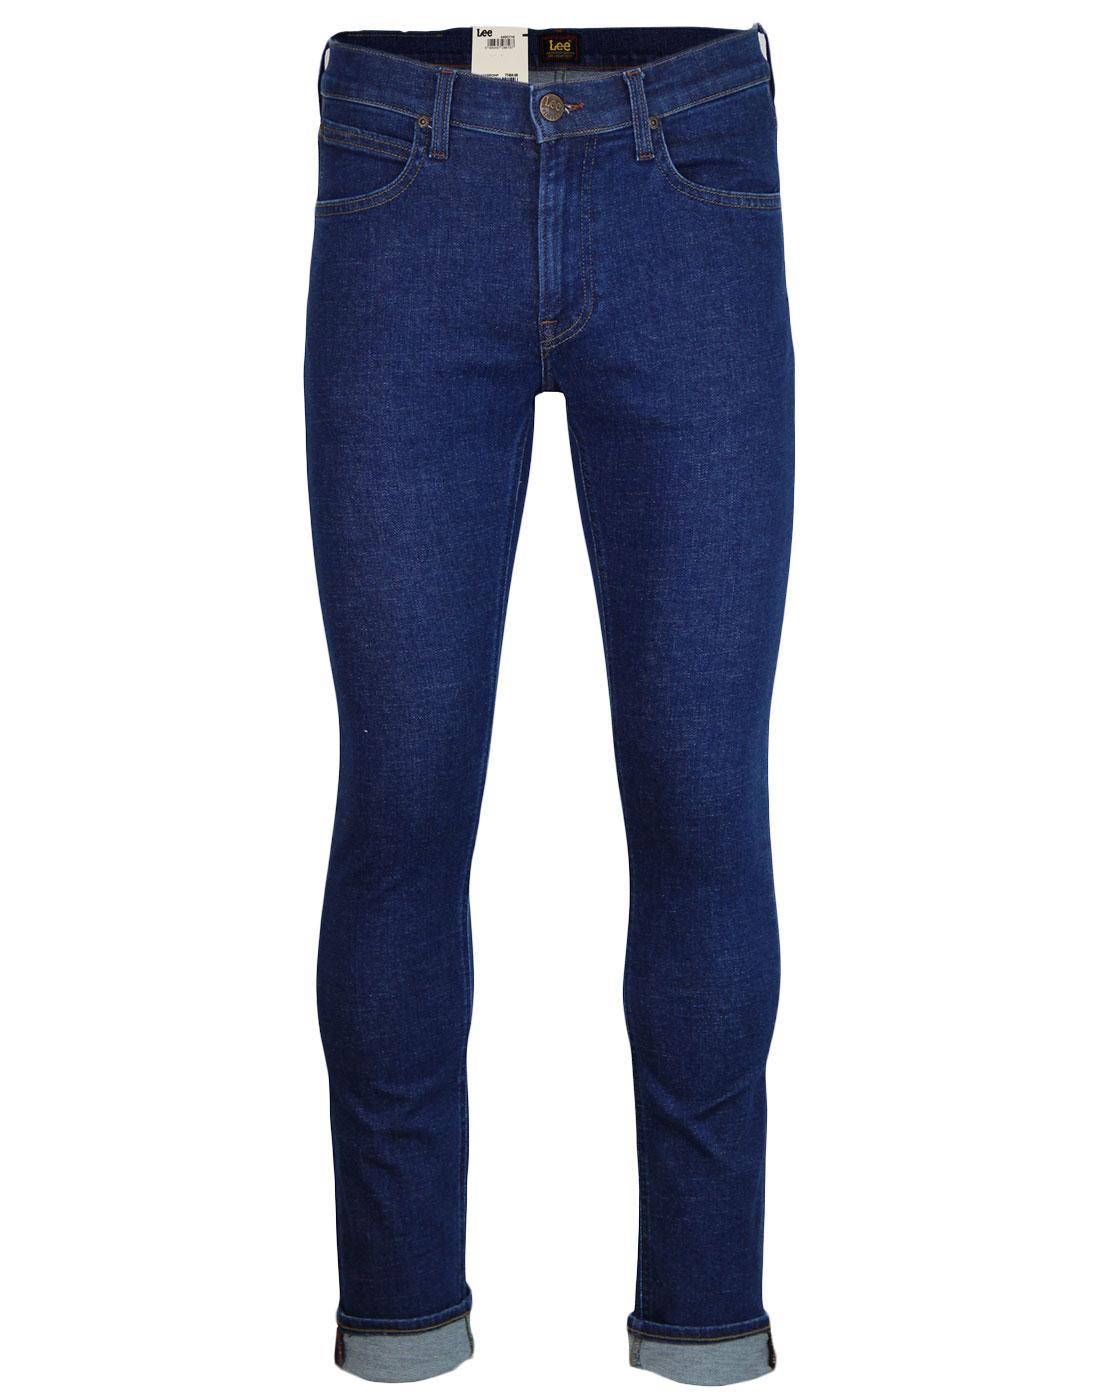 Luke LEE Slim Tapered Retro Mod Denim Jeans YOYO